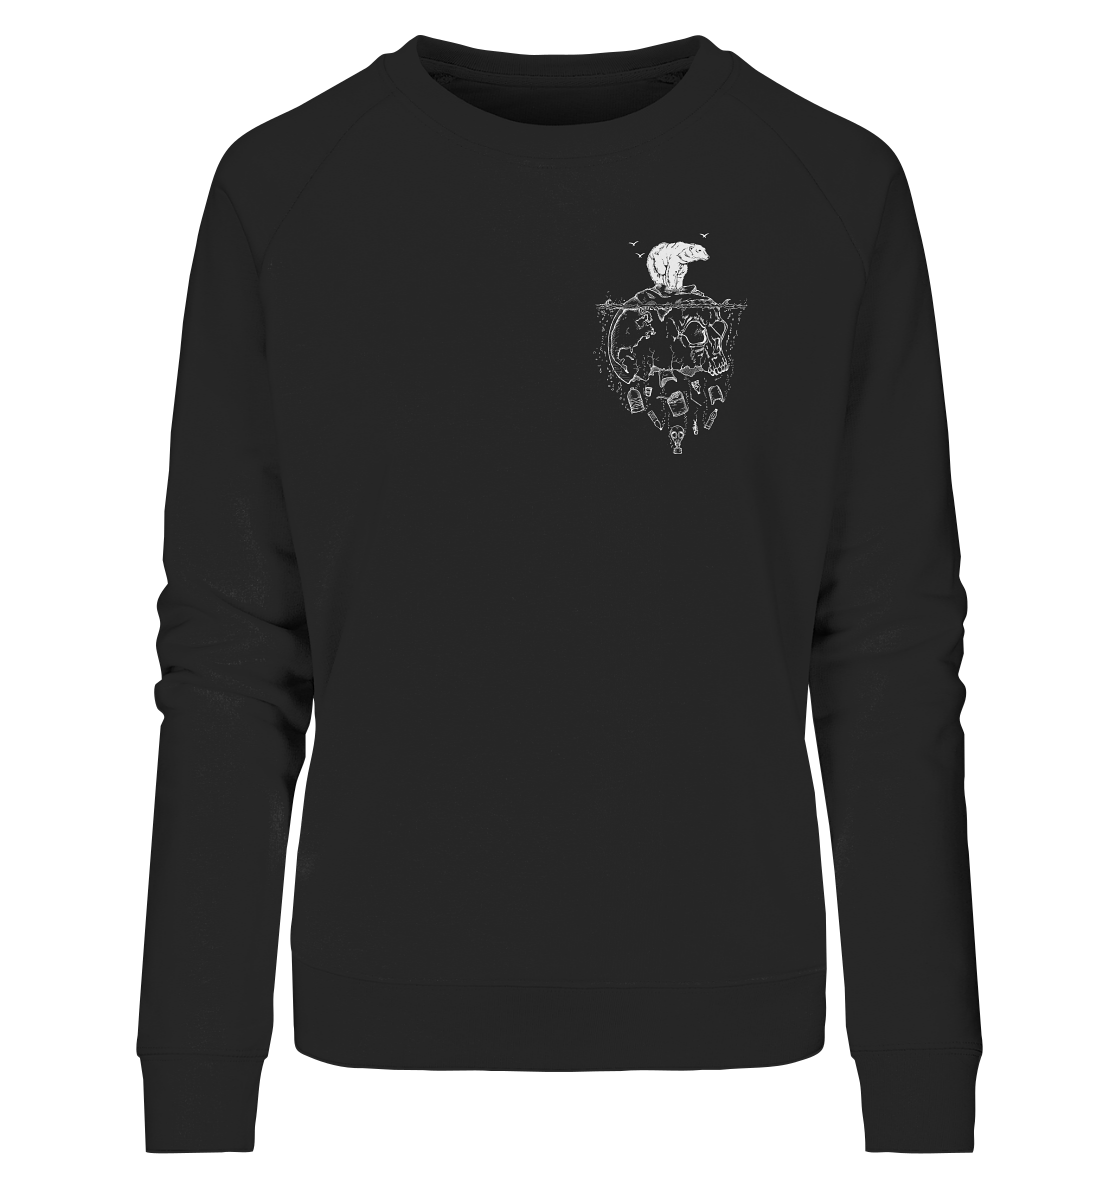 front-ladies-organic-sweatshirt-272727-1116x-16.png